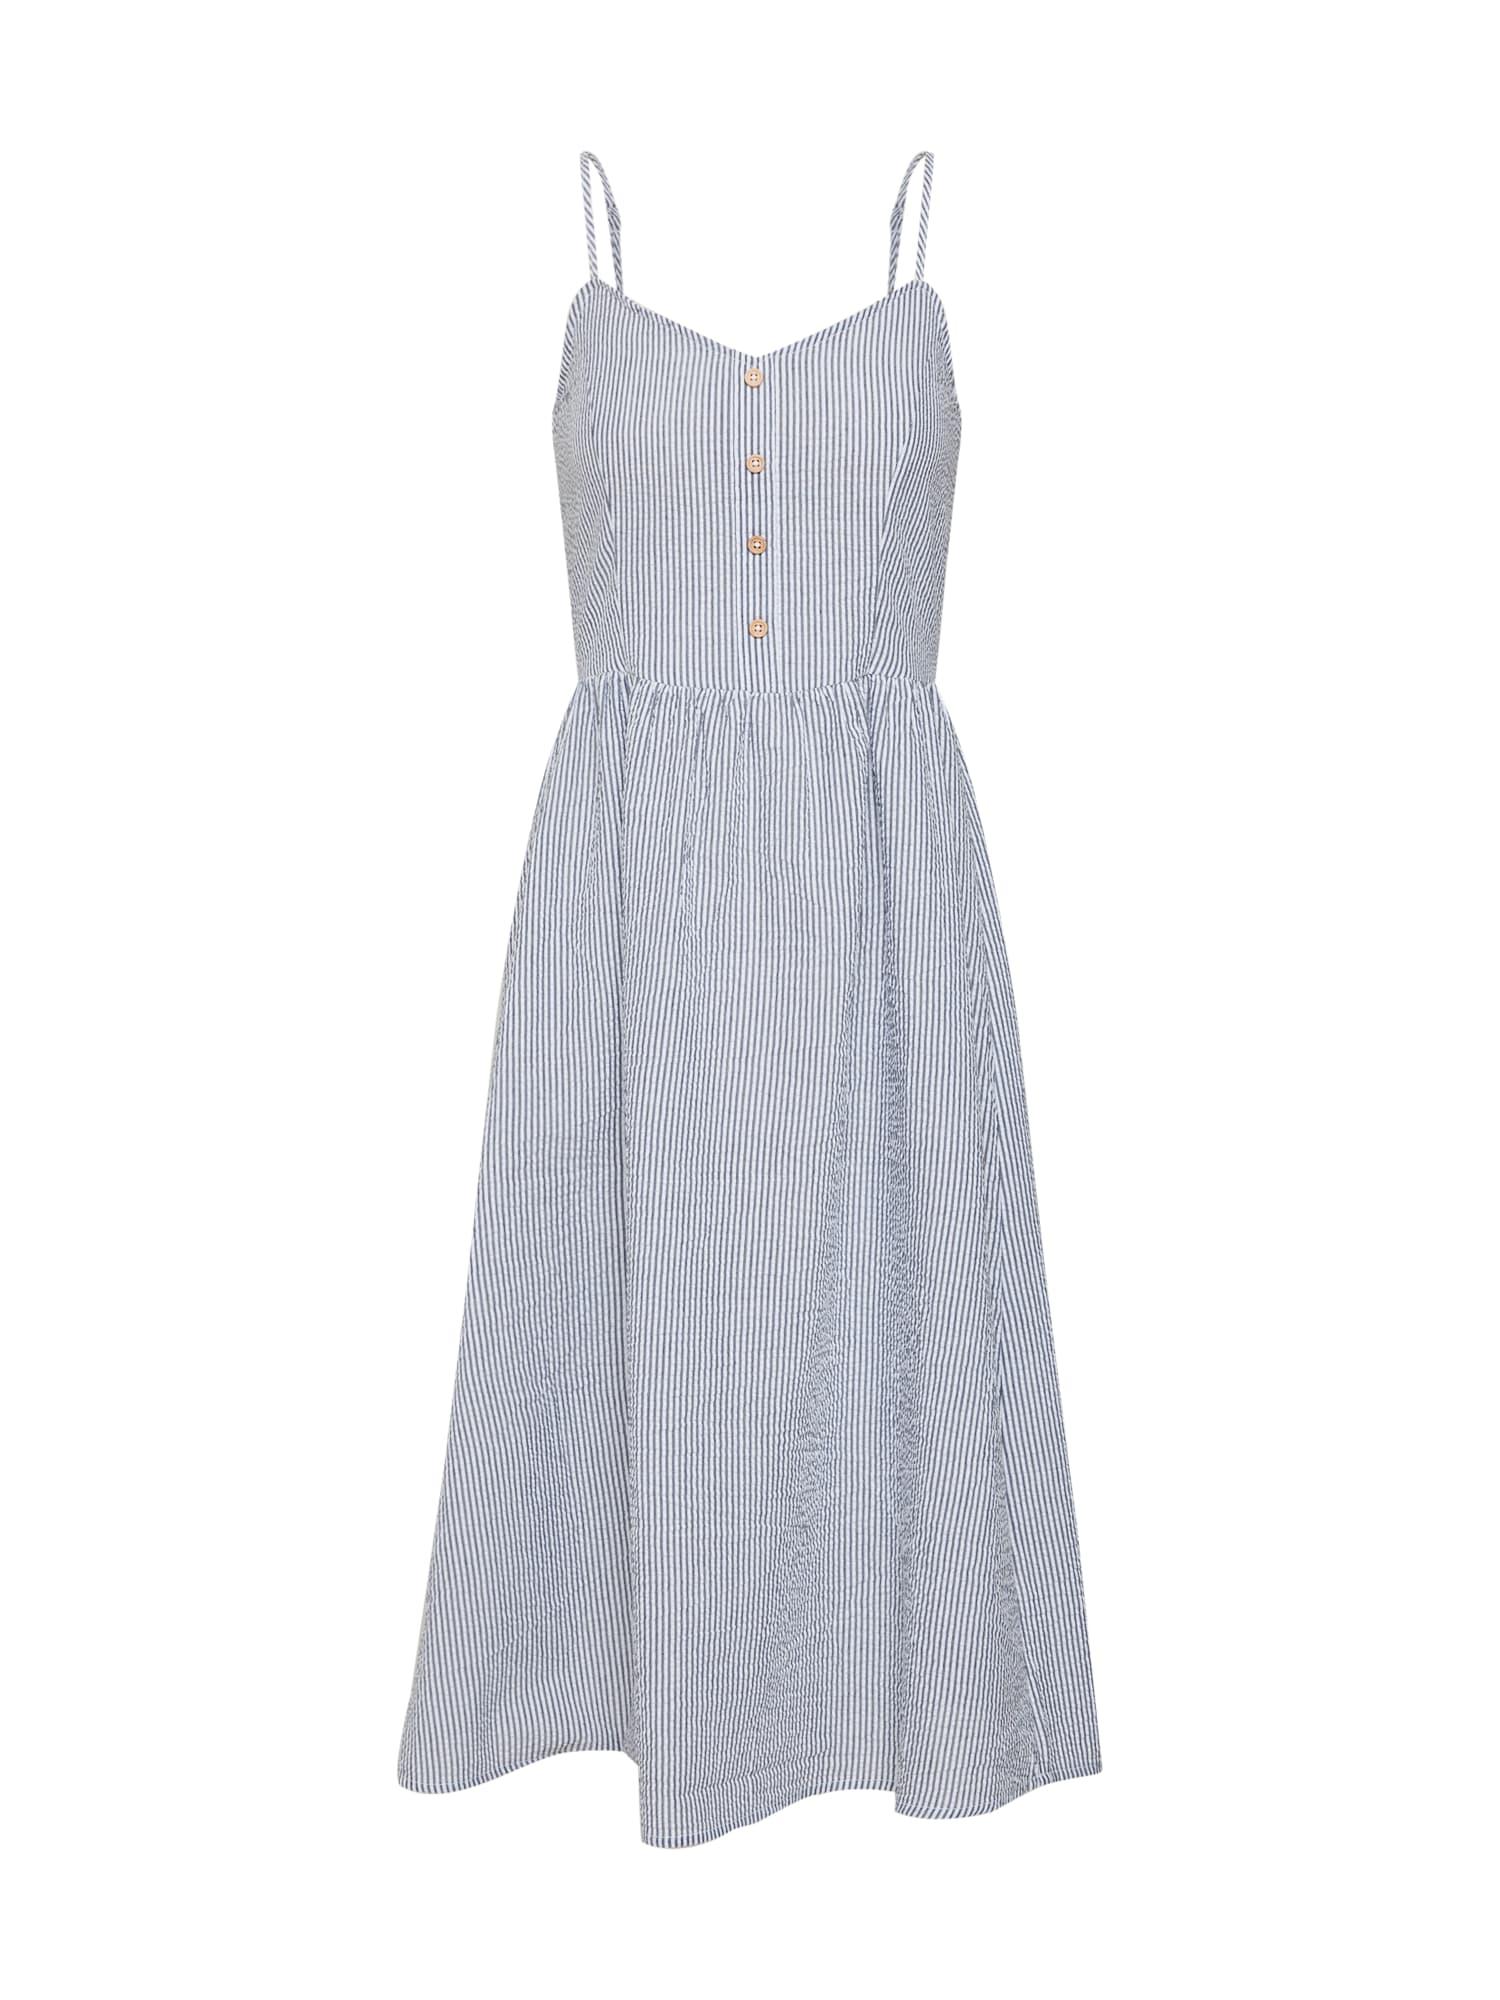 Letní šaty KARIM dunkelblau weiß JACQUELINE De YONG